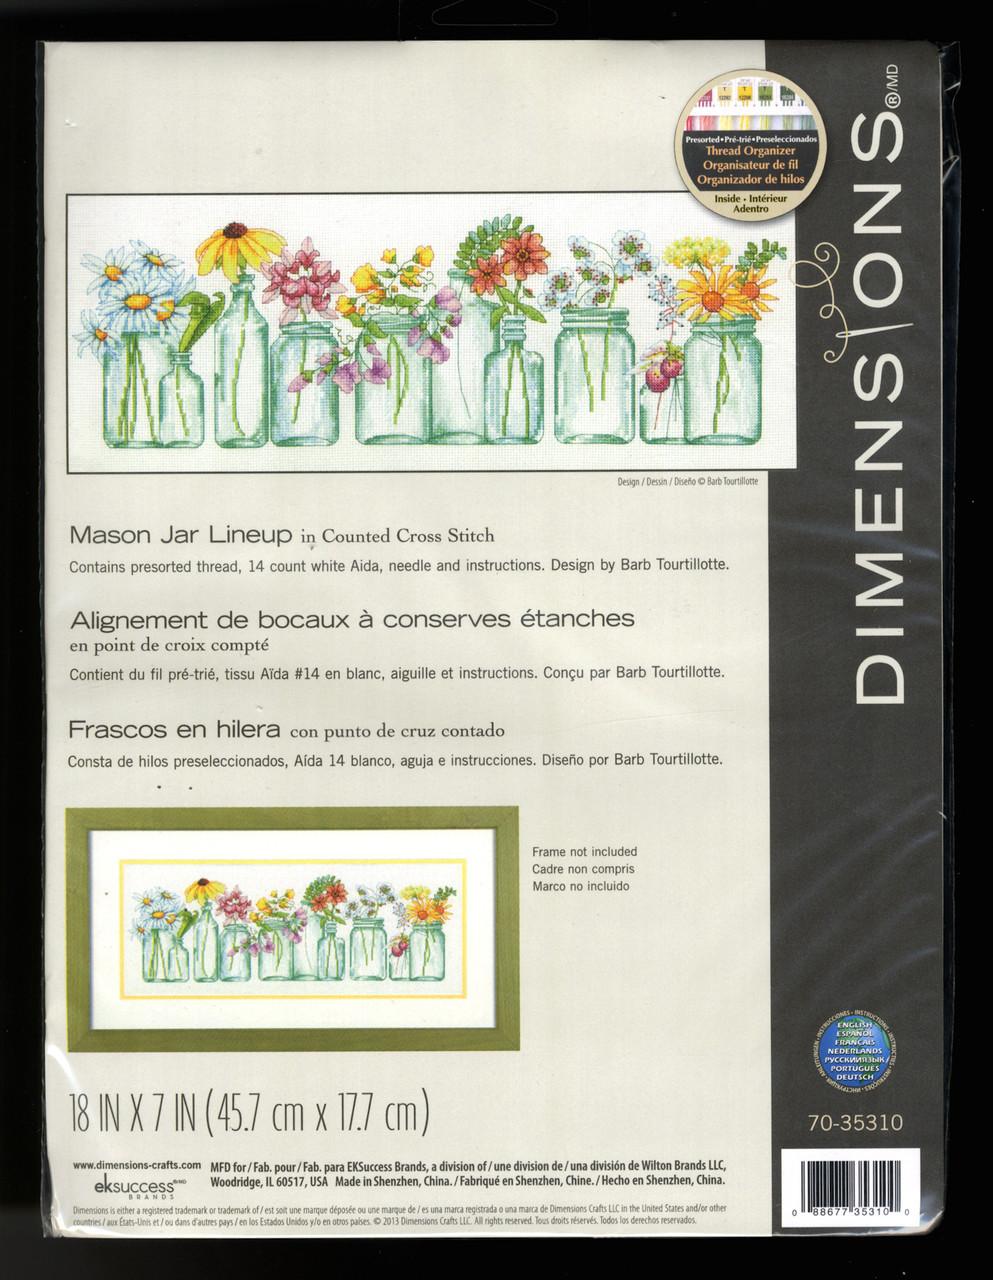 Dimensions - Mason Jar Lineup